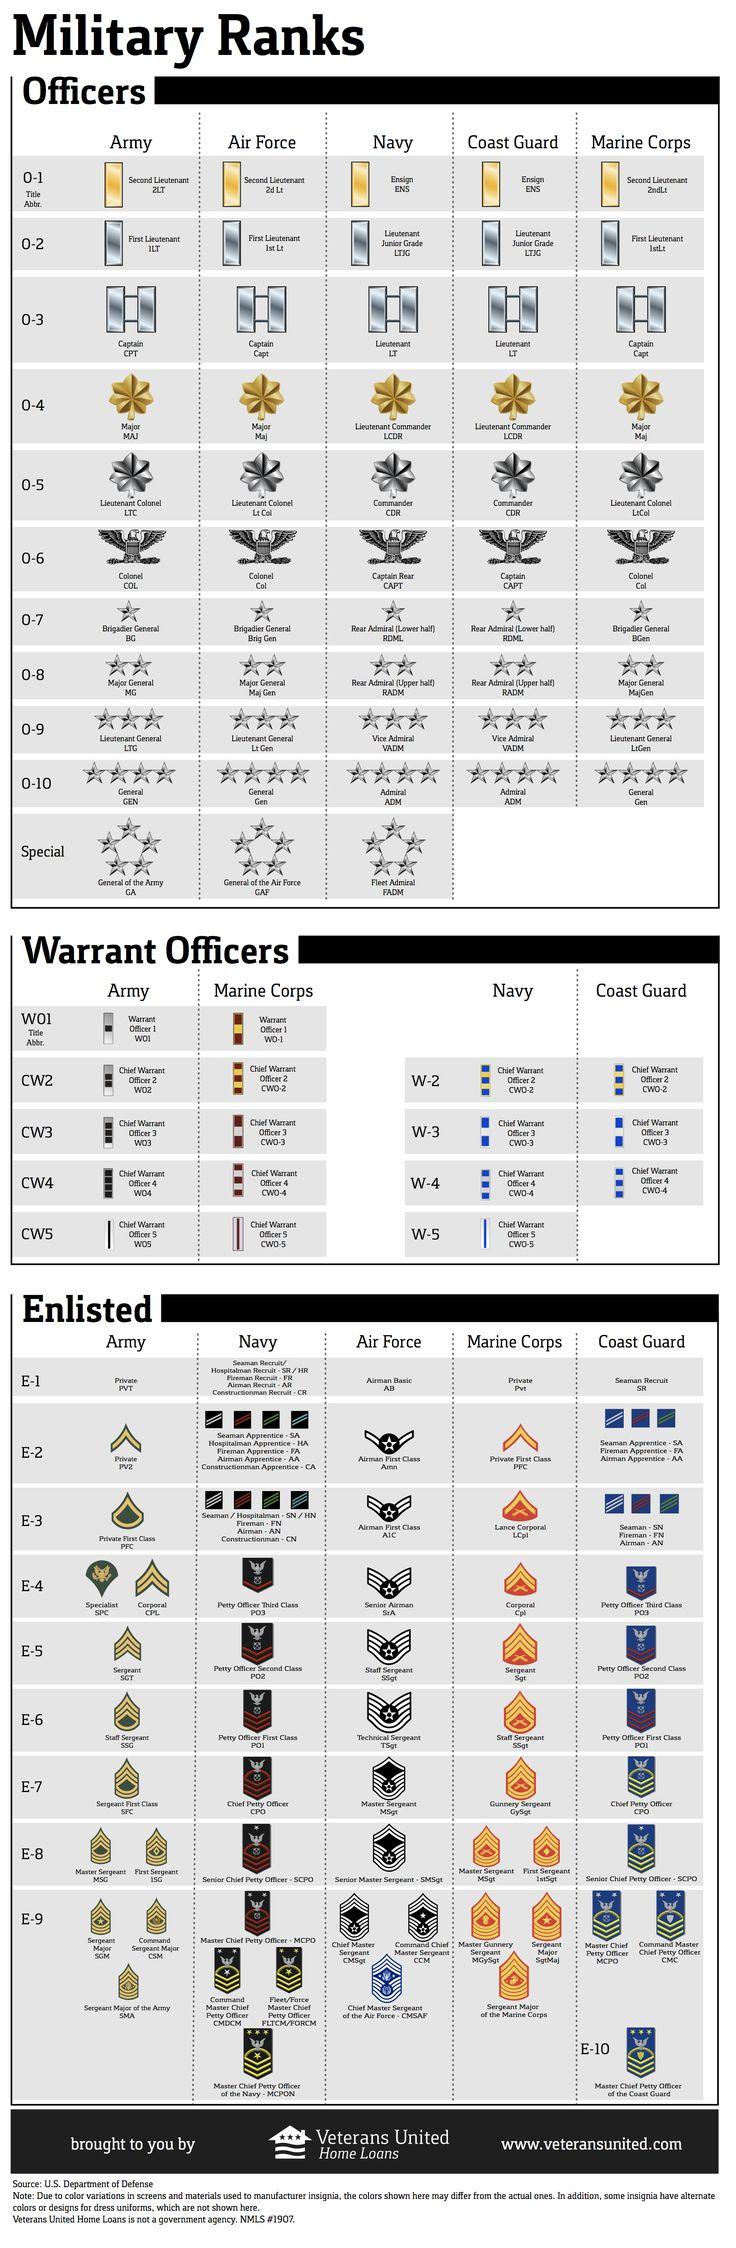 U.S military ranks.